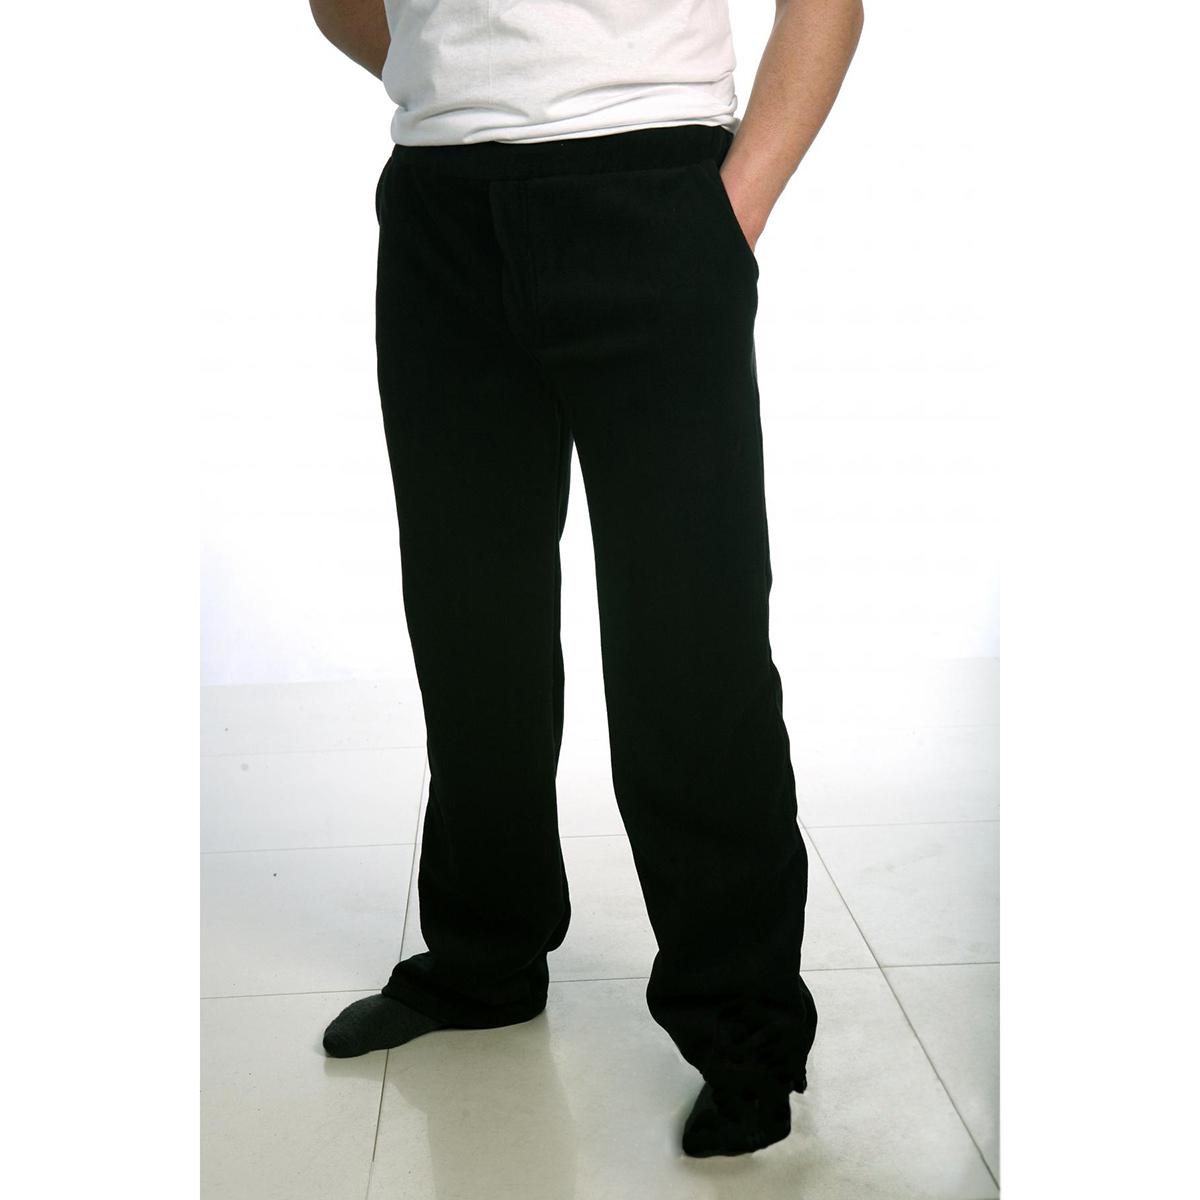 Мужские брюки Терм, размер 62Шорты, бриджи, брюки<br>Обхват груди:124 см<br>Обхват талии:118 см<br>Обхват бедер:124 см<br>Рост:178-188 см<br><br>Тип: Муж. брюки<br>Размер: 62<br>Материал: Флис